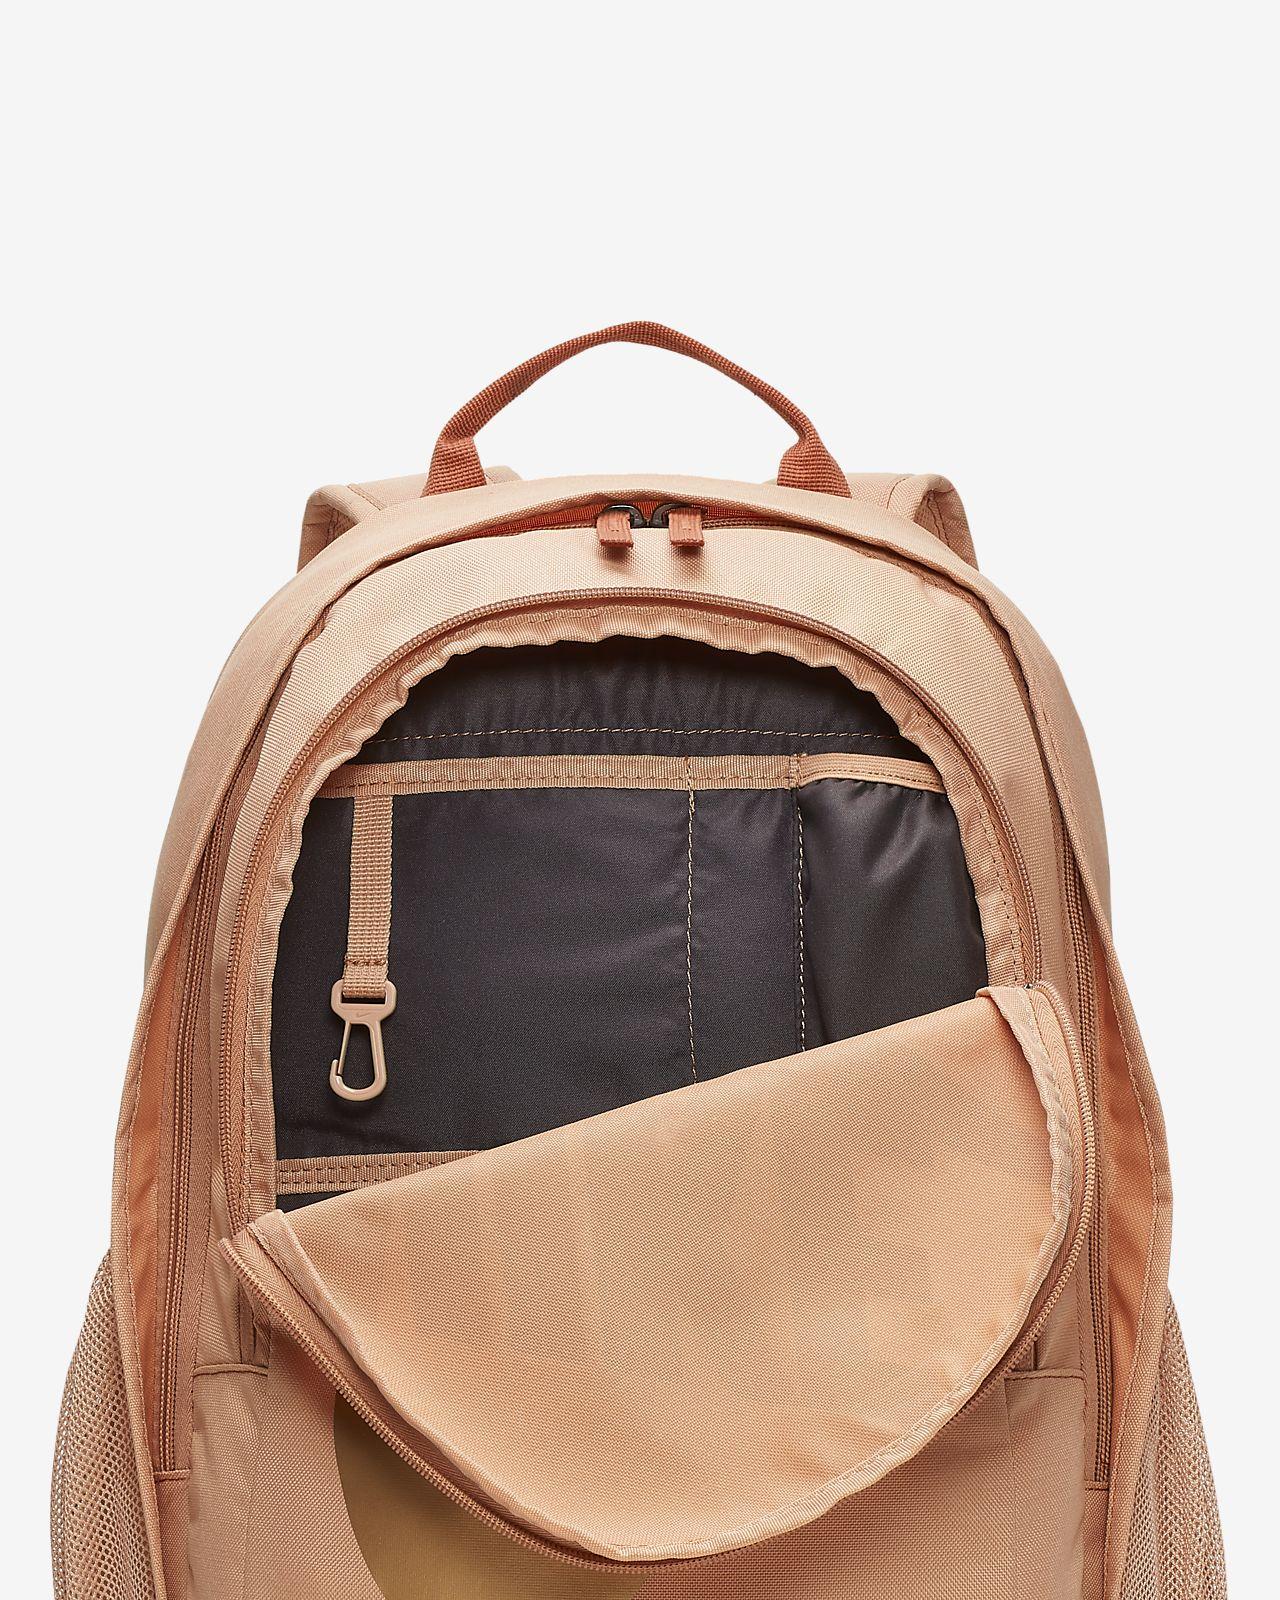 d2543027780e8 Nike Black And Rose Gold Backpack | Building Materials Bargain Center